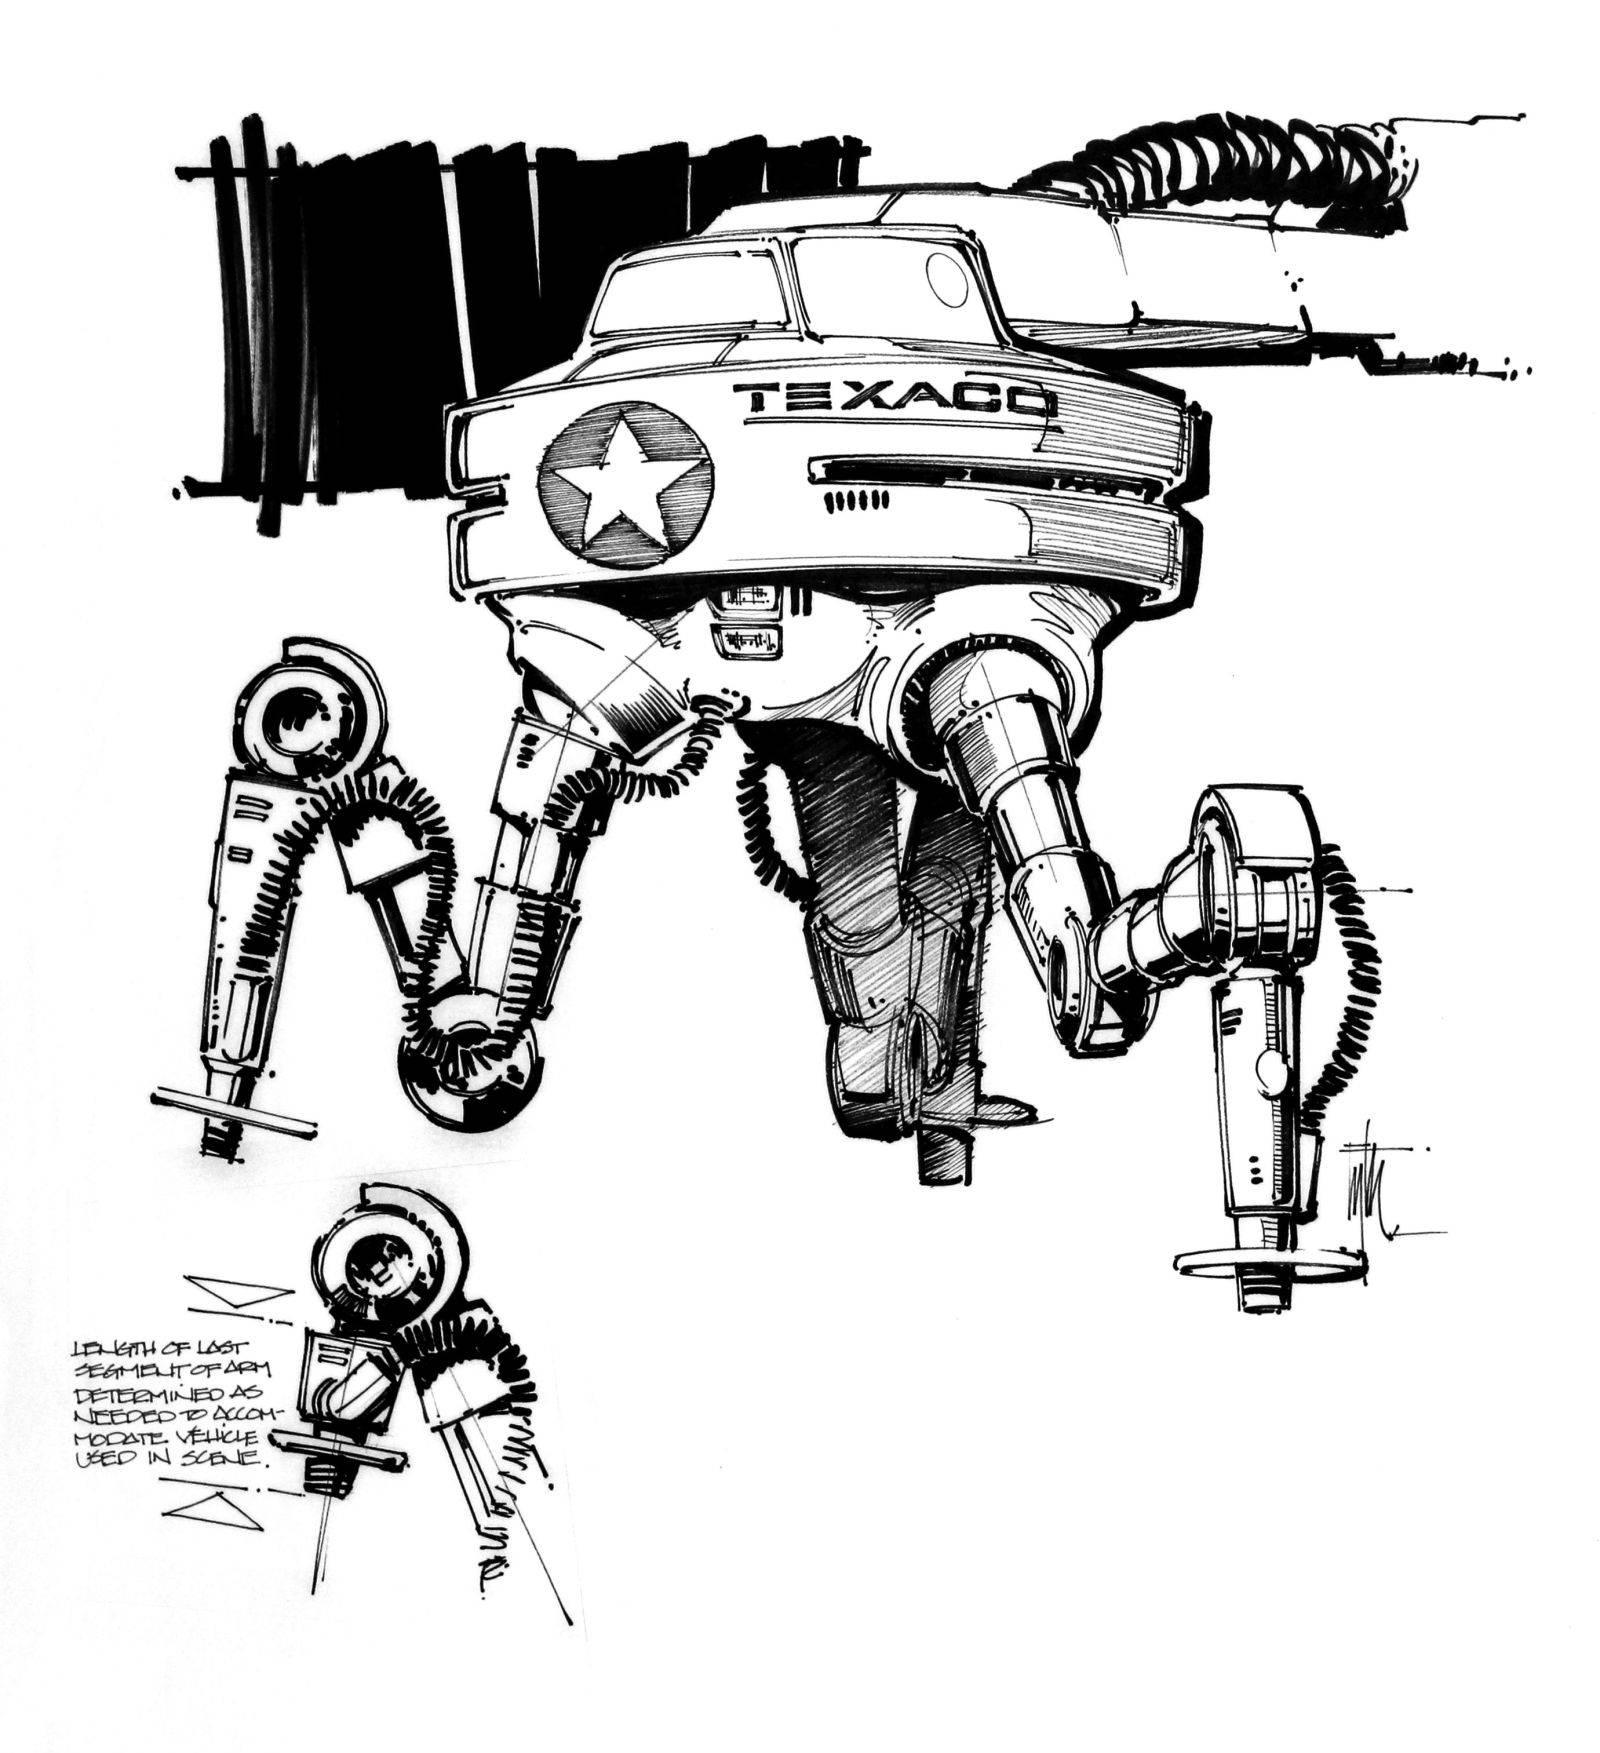 Техника из «Назад в будущее 2» на концепт-артах 16